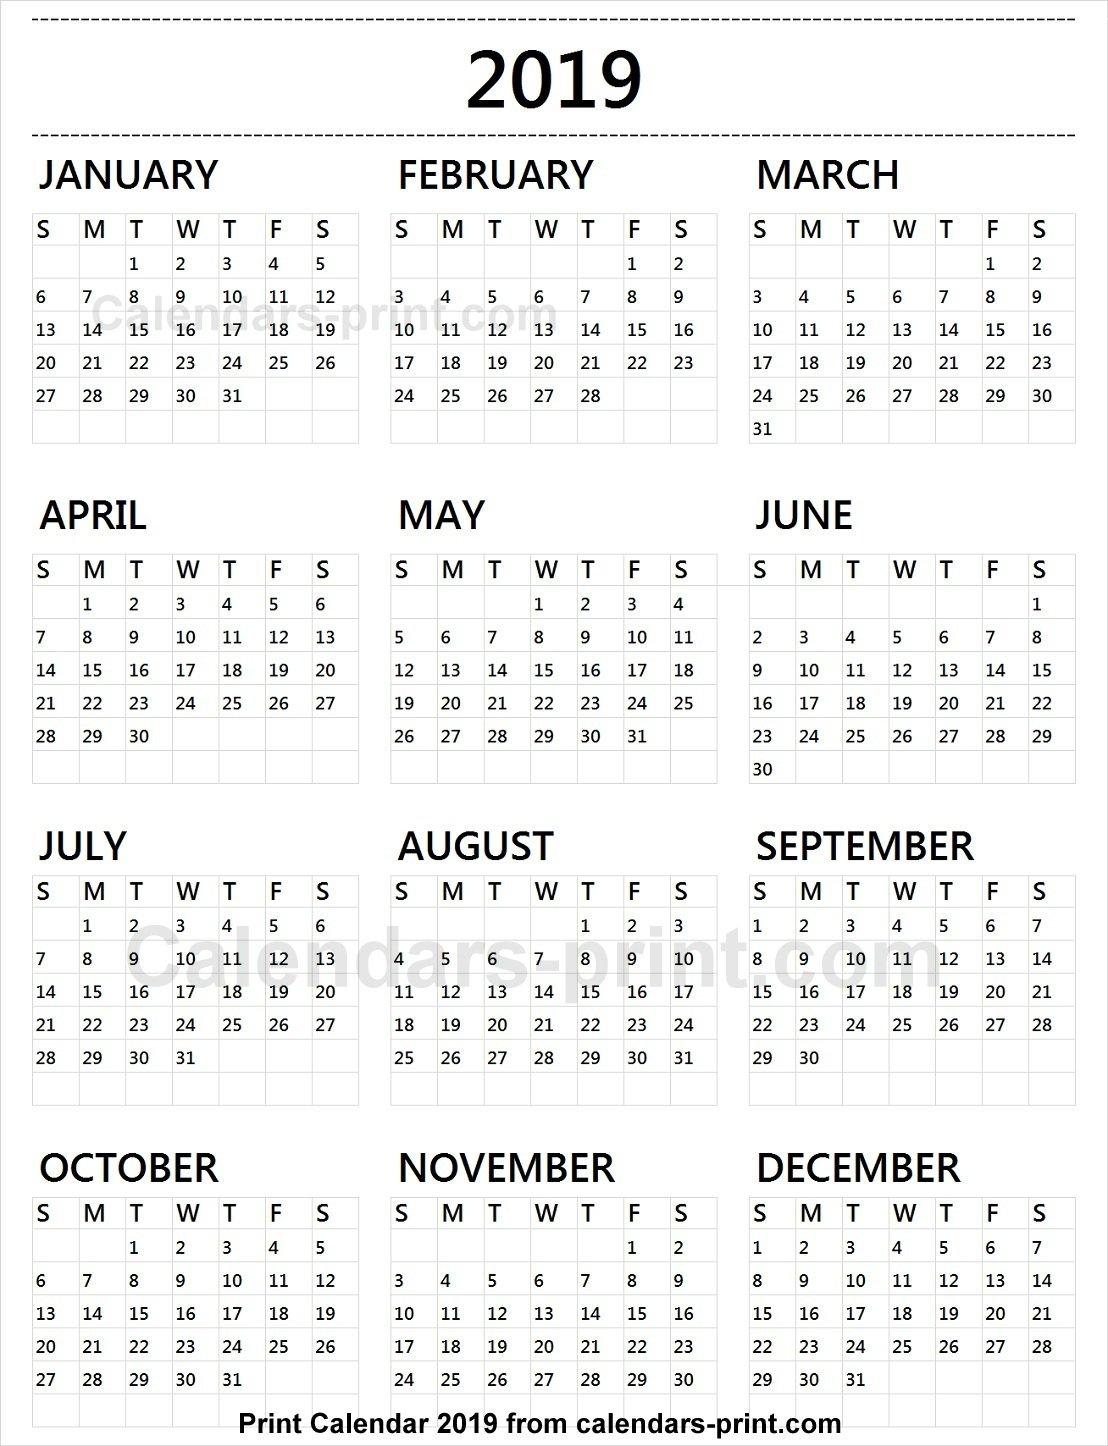 Calendar 2019 Tumblr To Print Free | Download Blank Pdf Template Calendar 2019 Pdf Free Download